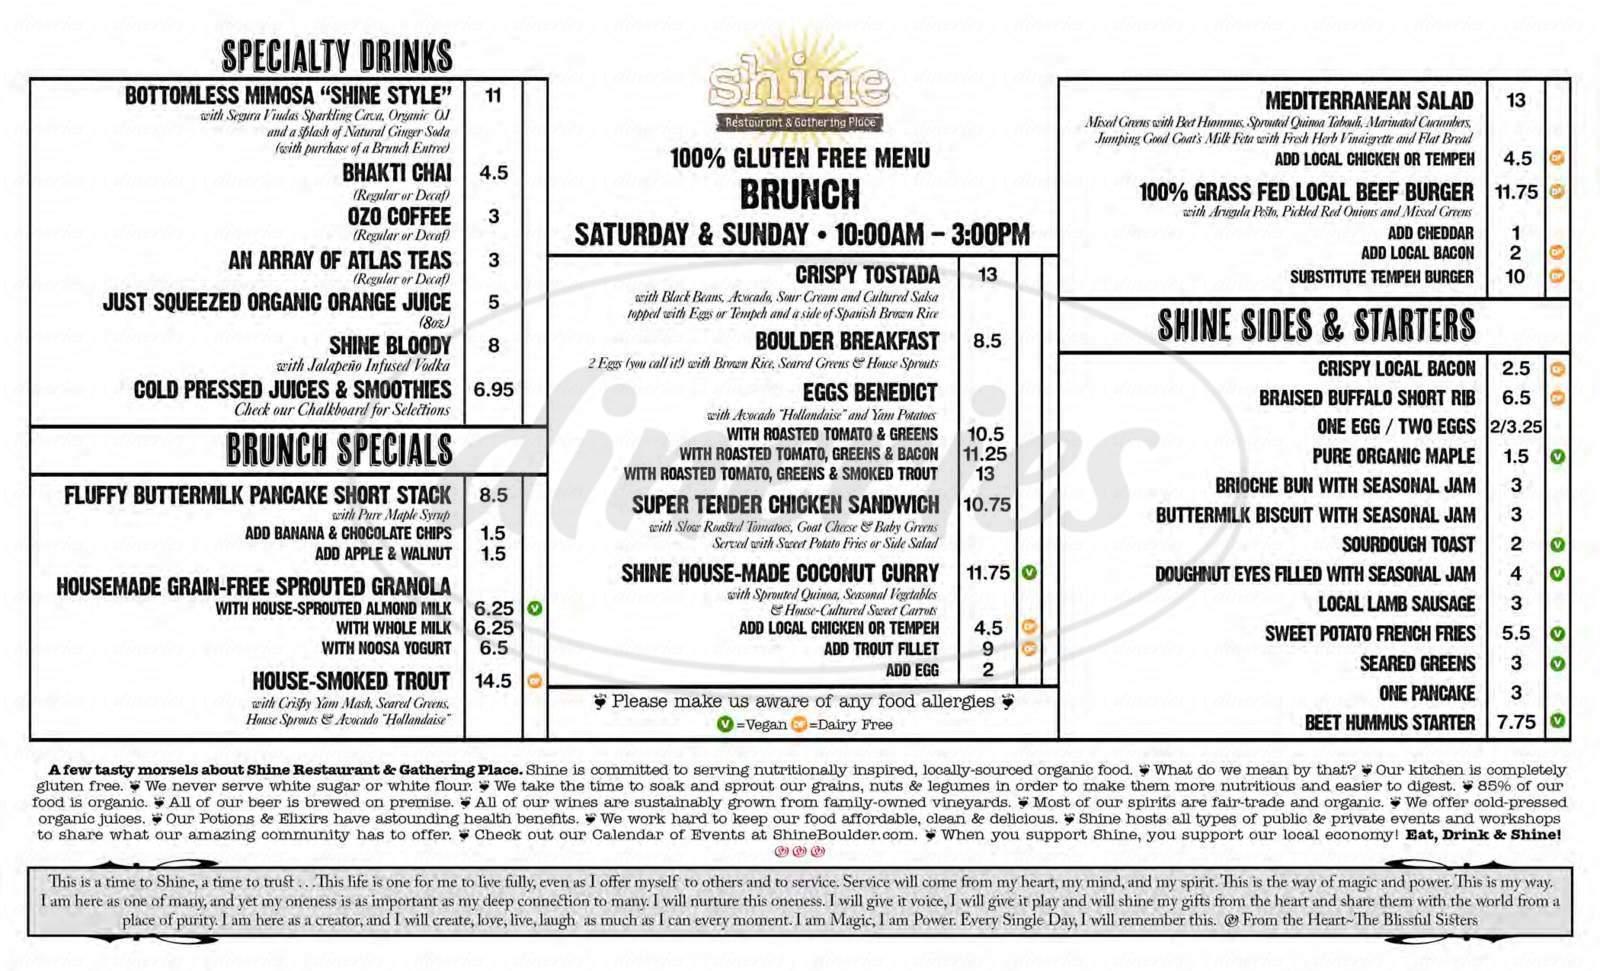 menu for Shine Restaurant & Gathering Place